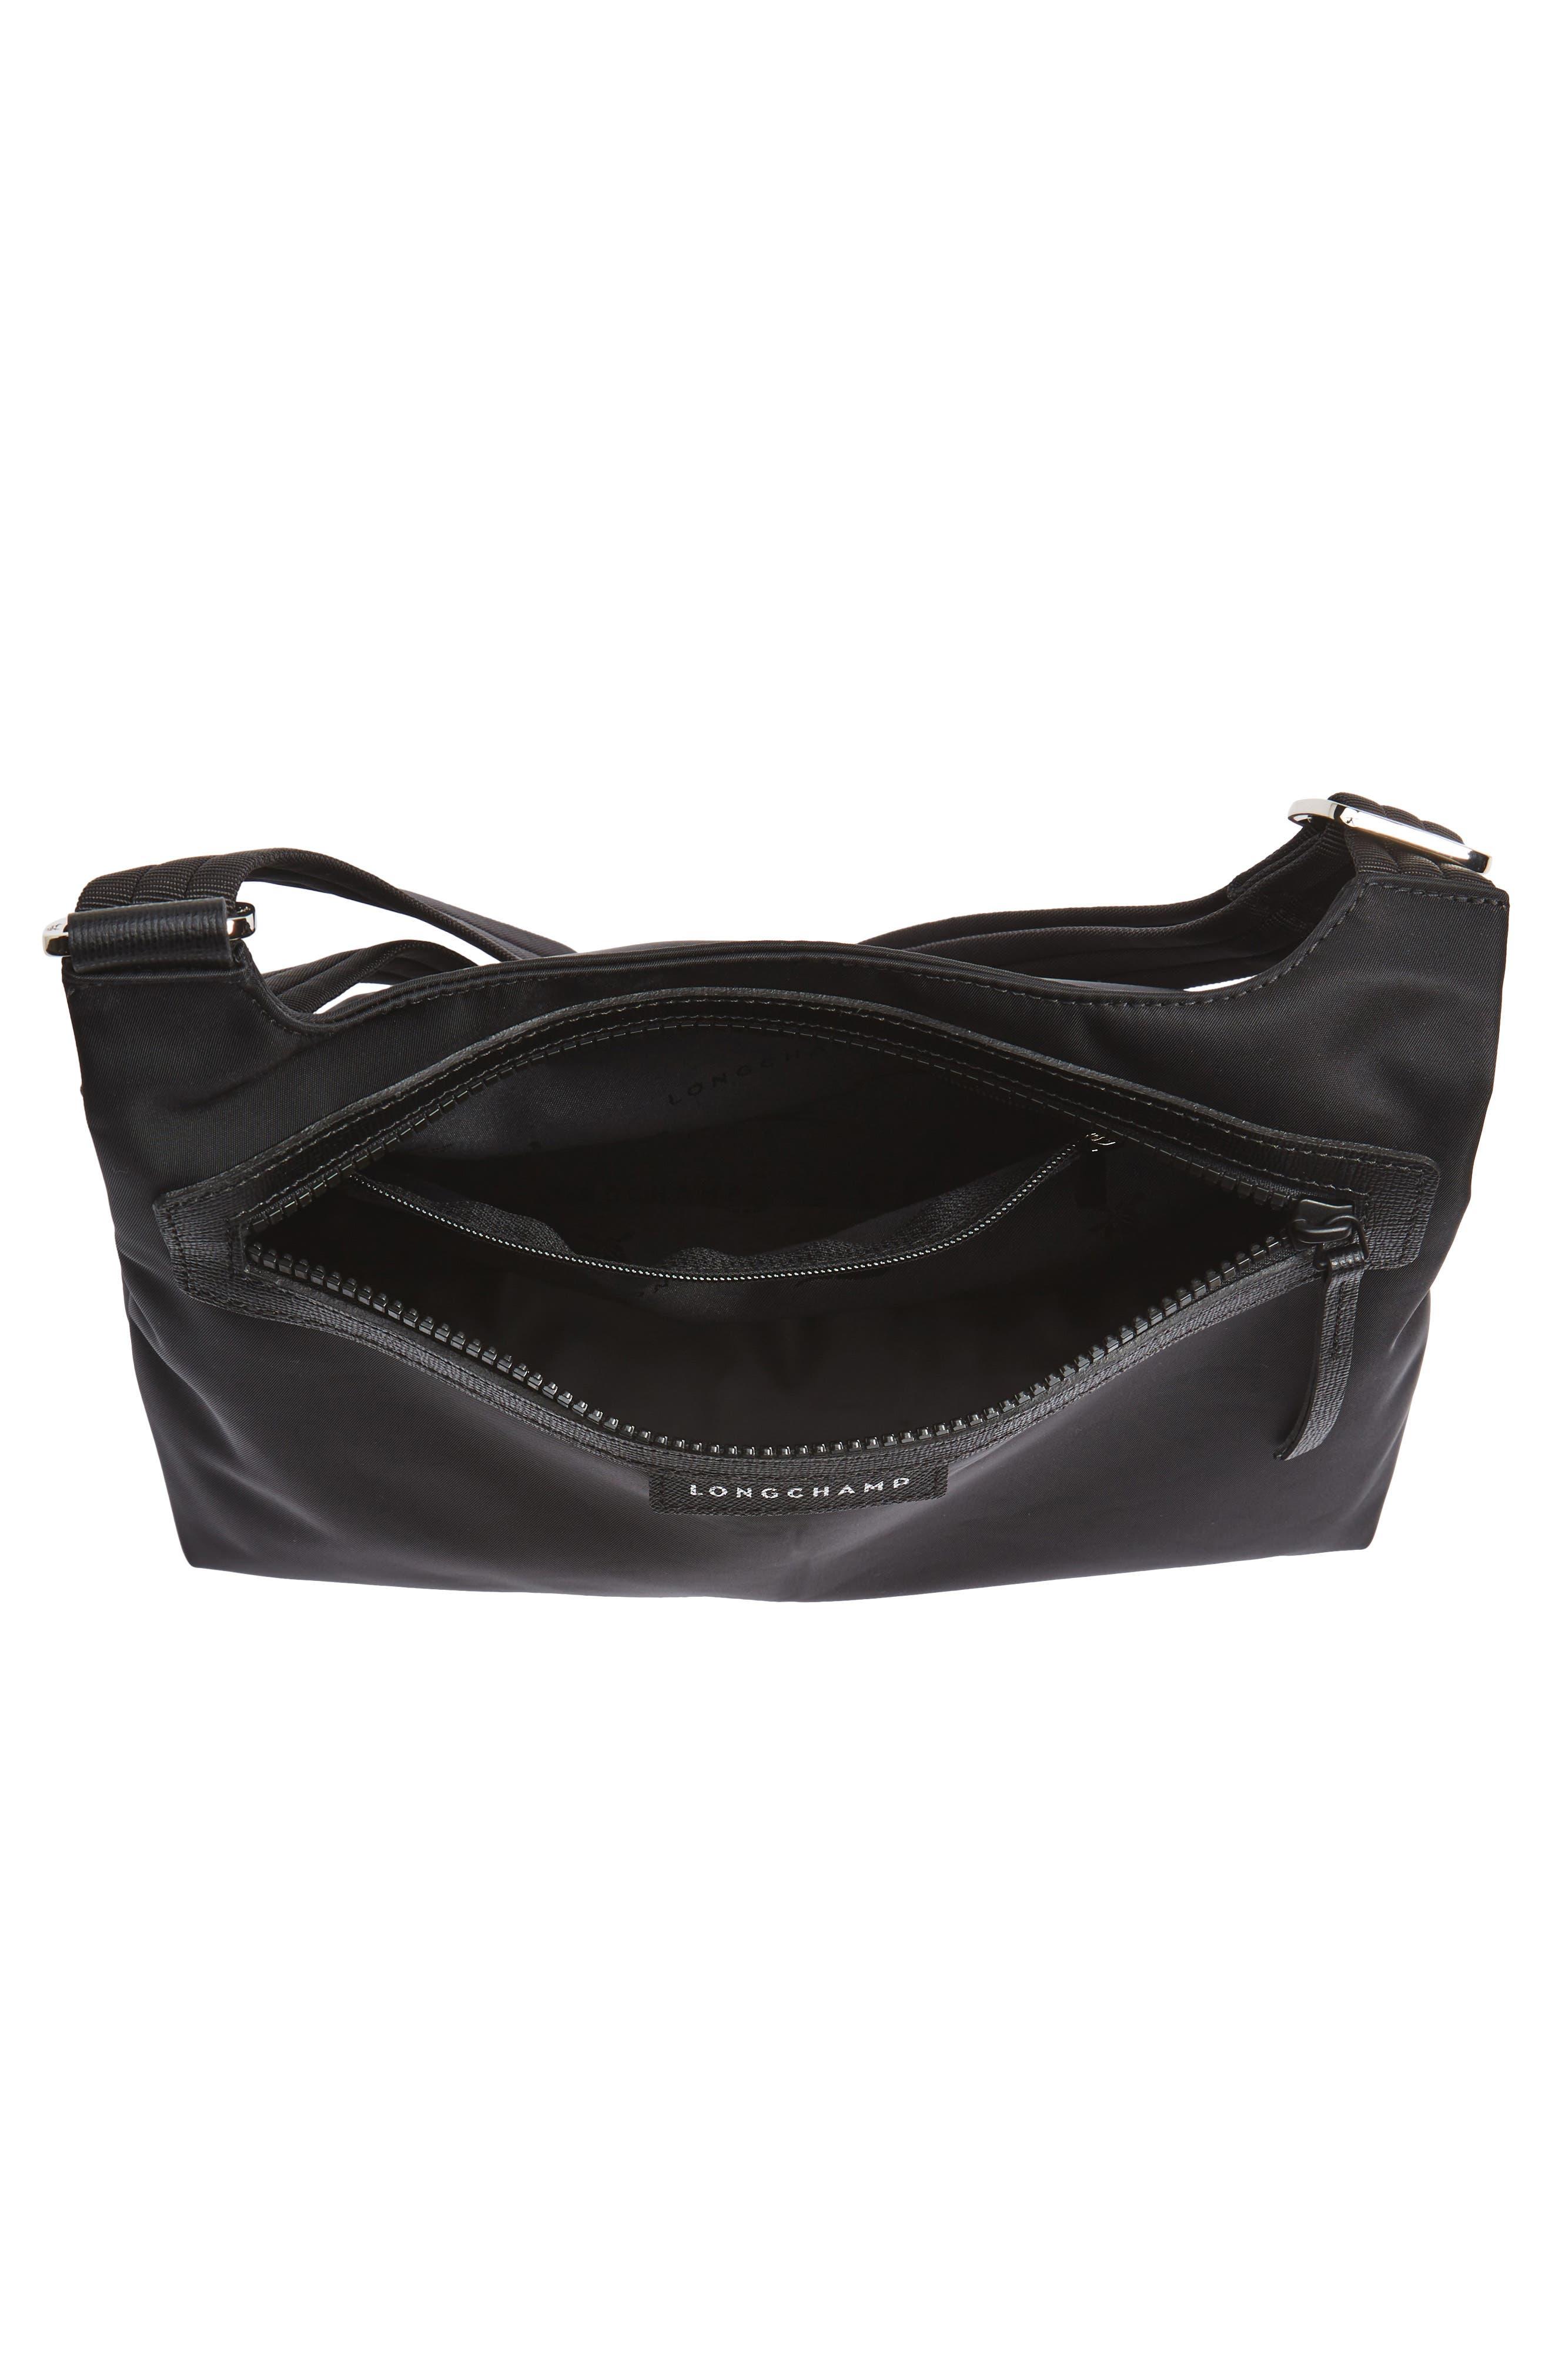 'Le Pliage Neo' Nylon Crossbody Bag,                             Alternate thumbnail 5, color,                             BLACK